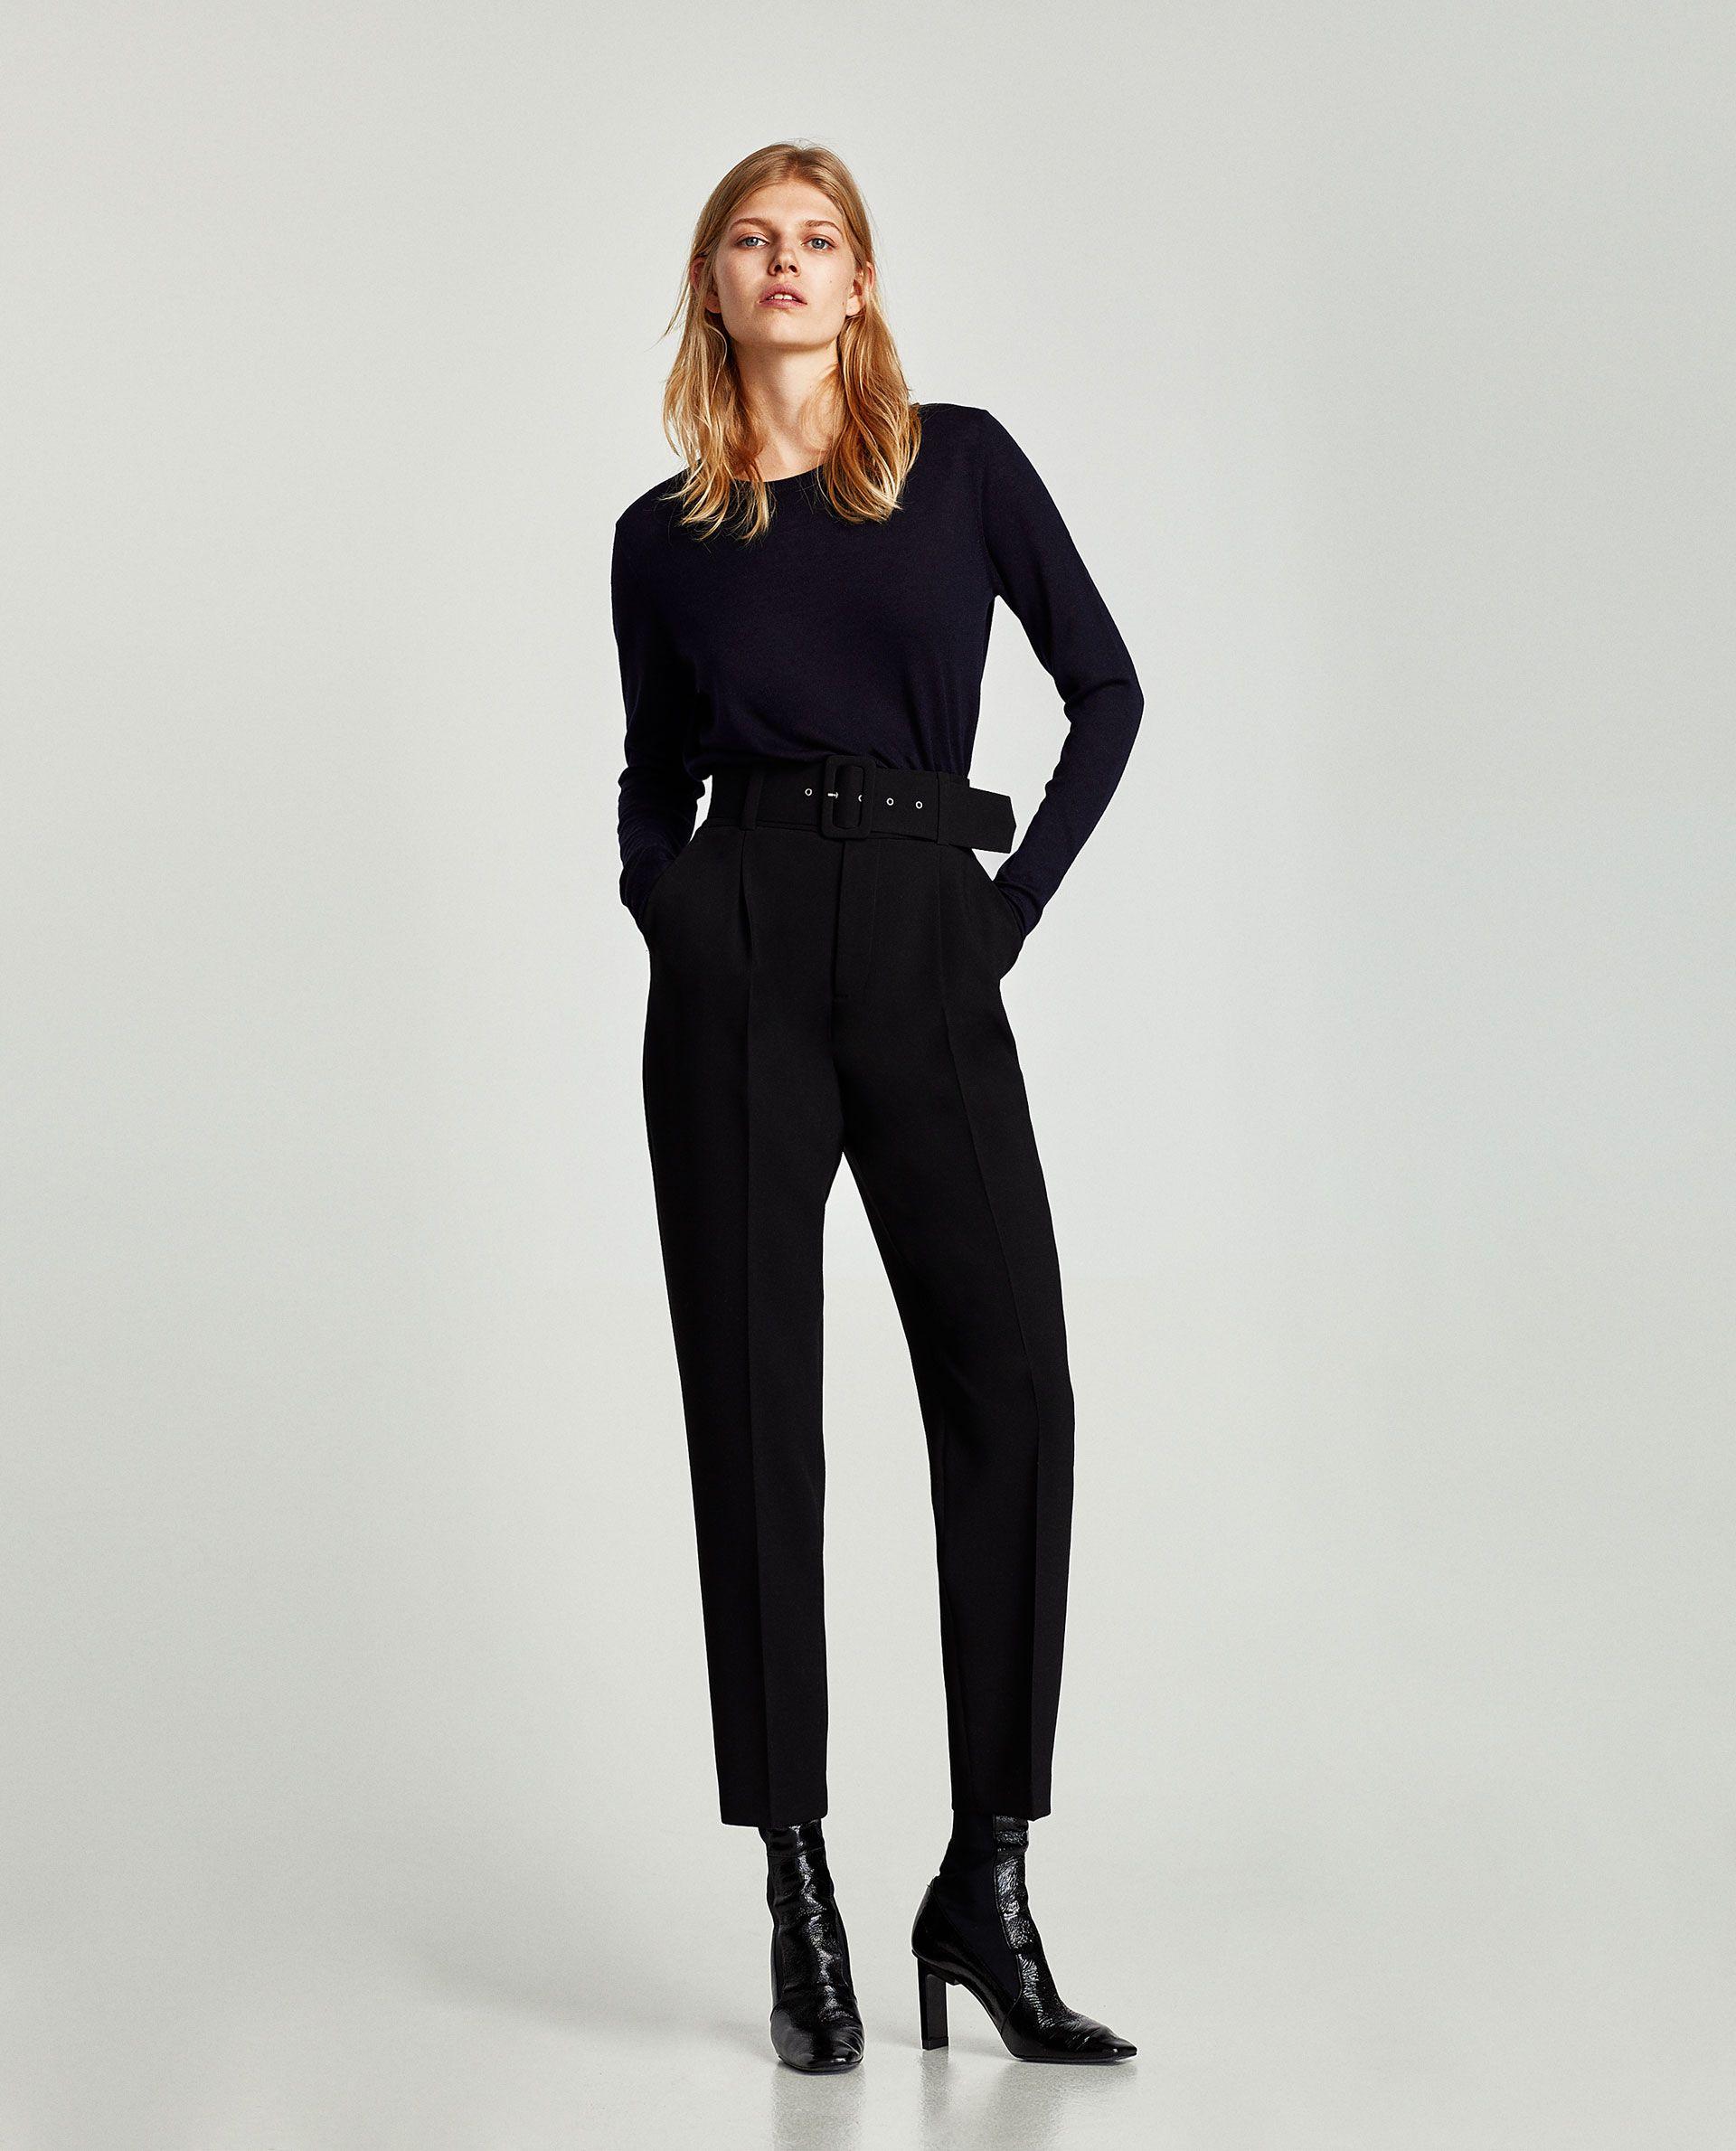 pas mal 09f67 9a718 PANTALÓN CREPE CINTURÓN | Corporate Work Style | Pantalones ...